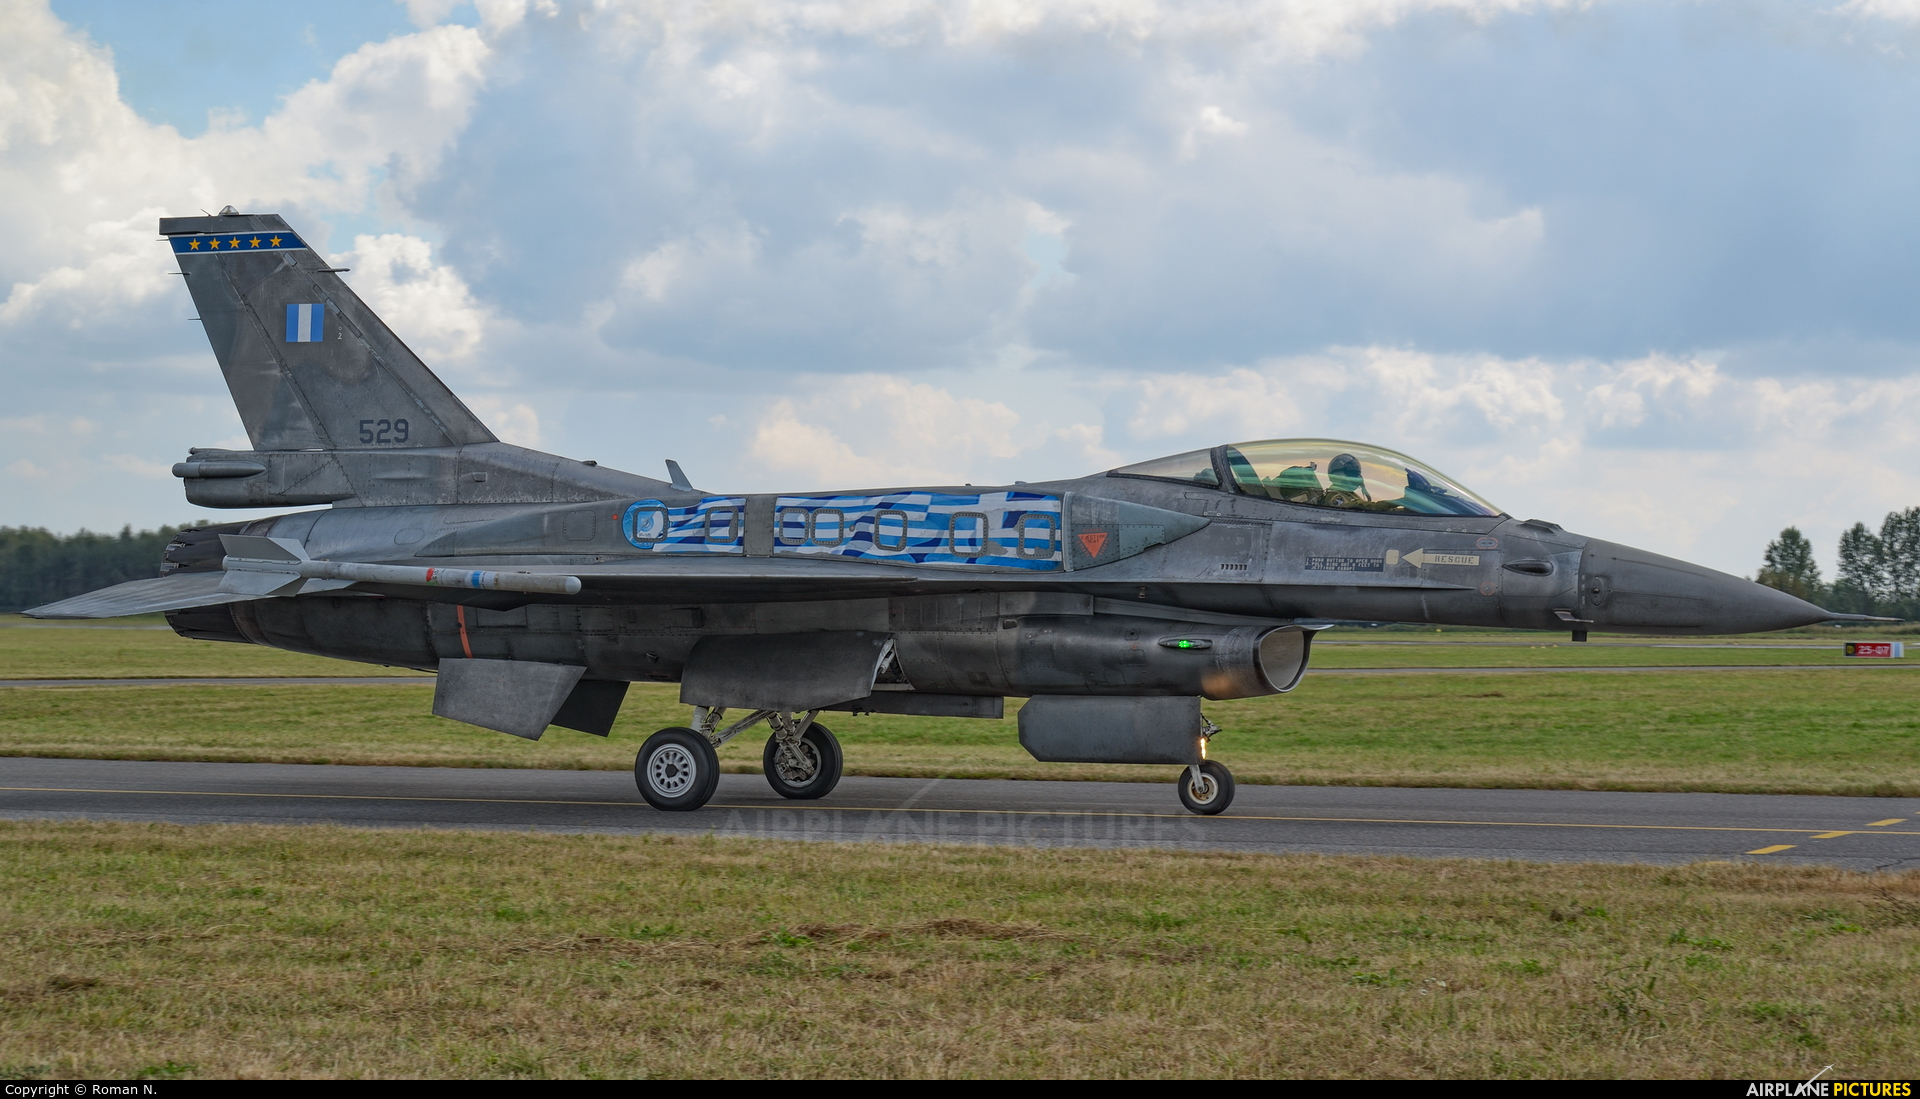 Greece - Hellenic Air Force 529 aircraft at Radom - Sadków